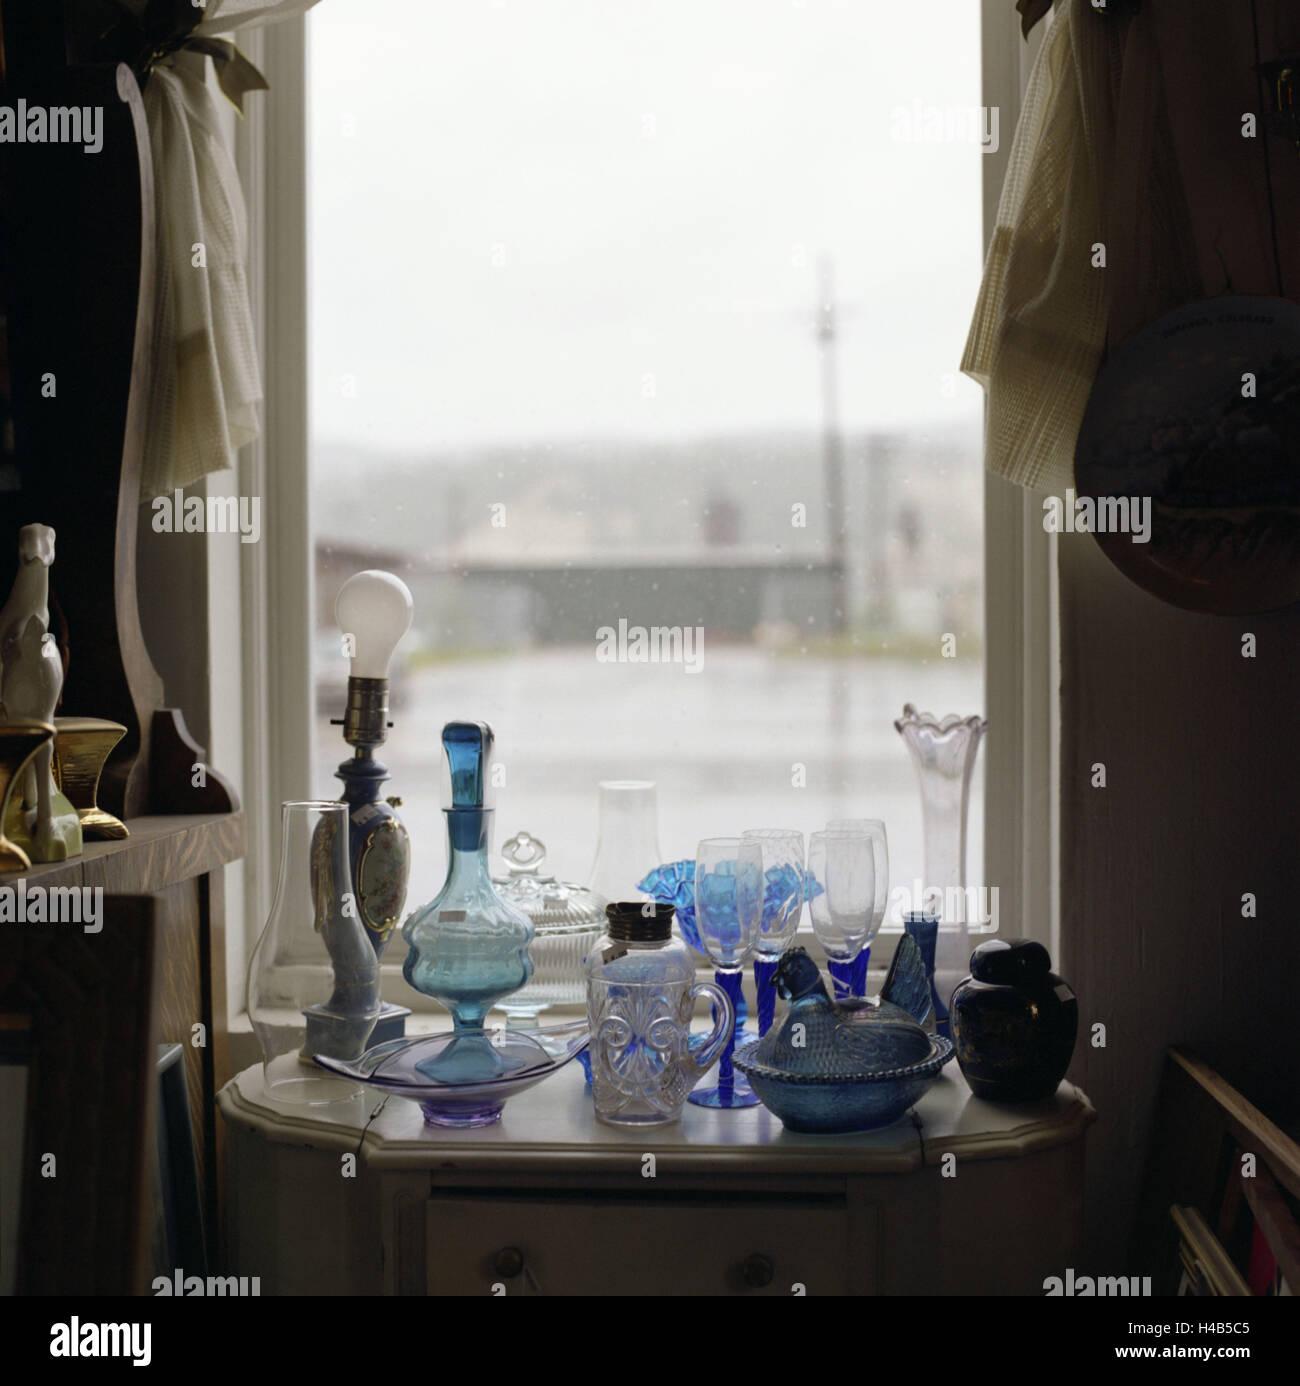 USA, Montana, Libby, antique shop, interior, window, table, glass, Nippes, Stock Photo